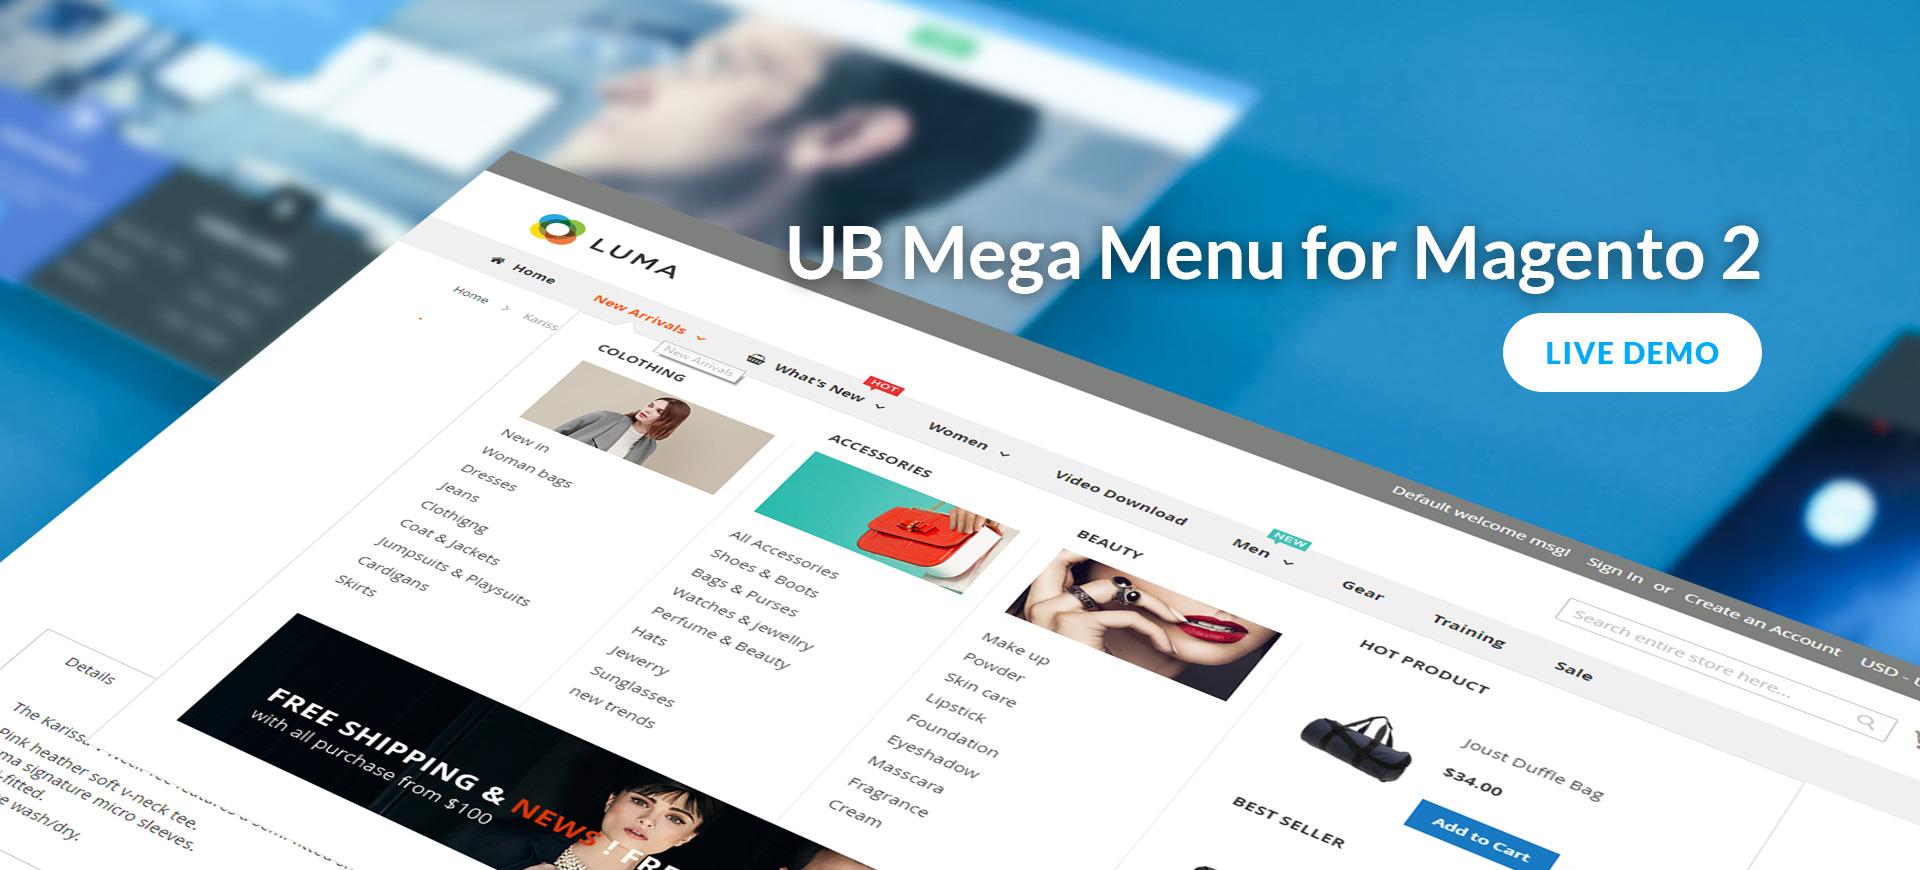 UB Mega Menu - Handy drag and drop Mega Menu for Magento 2